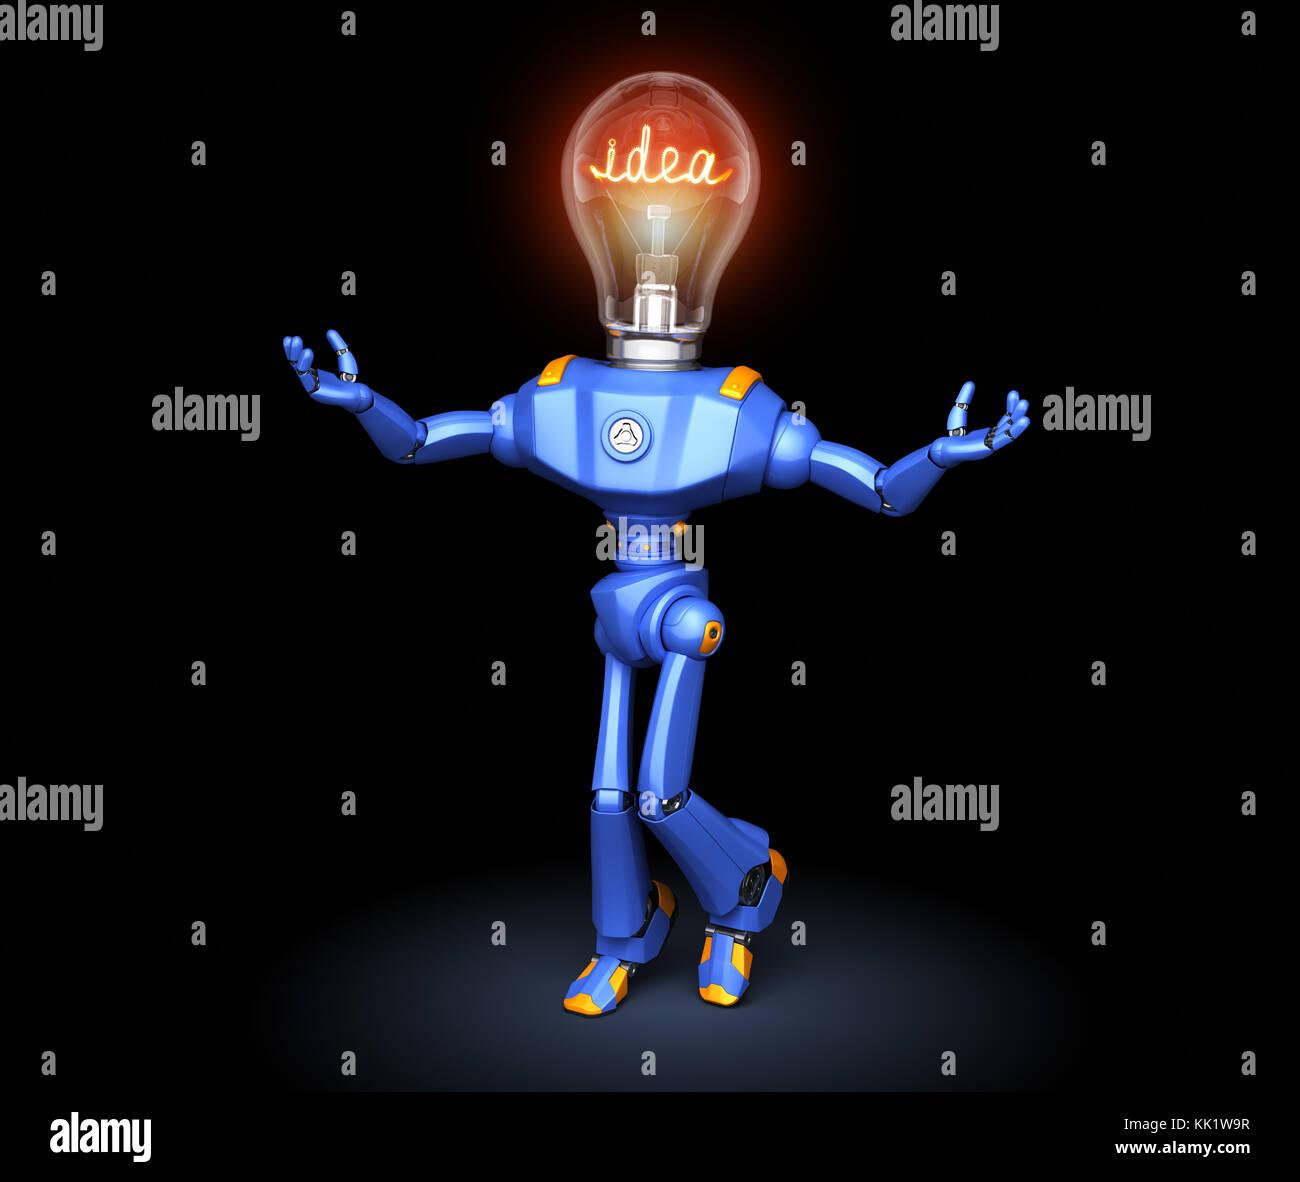 Niedliche Roboter Charakter Idee. 3D-Darstellung Stockbild